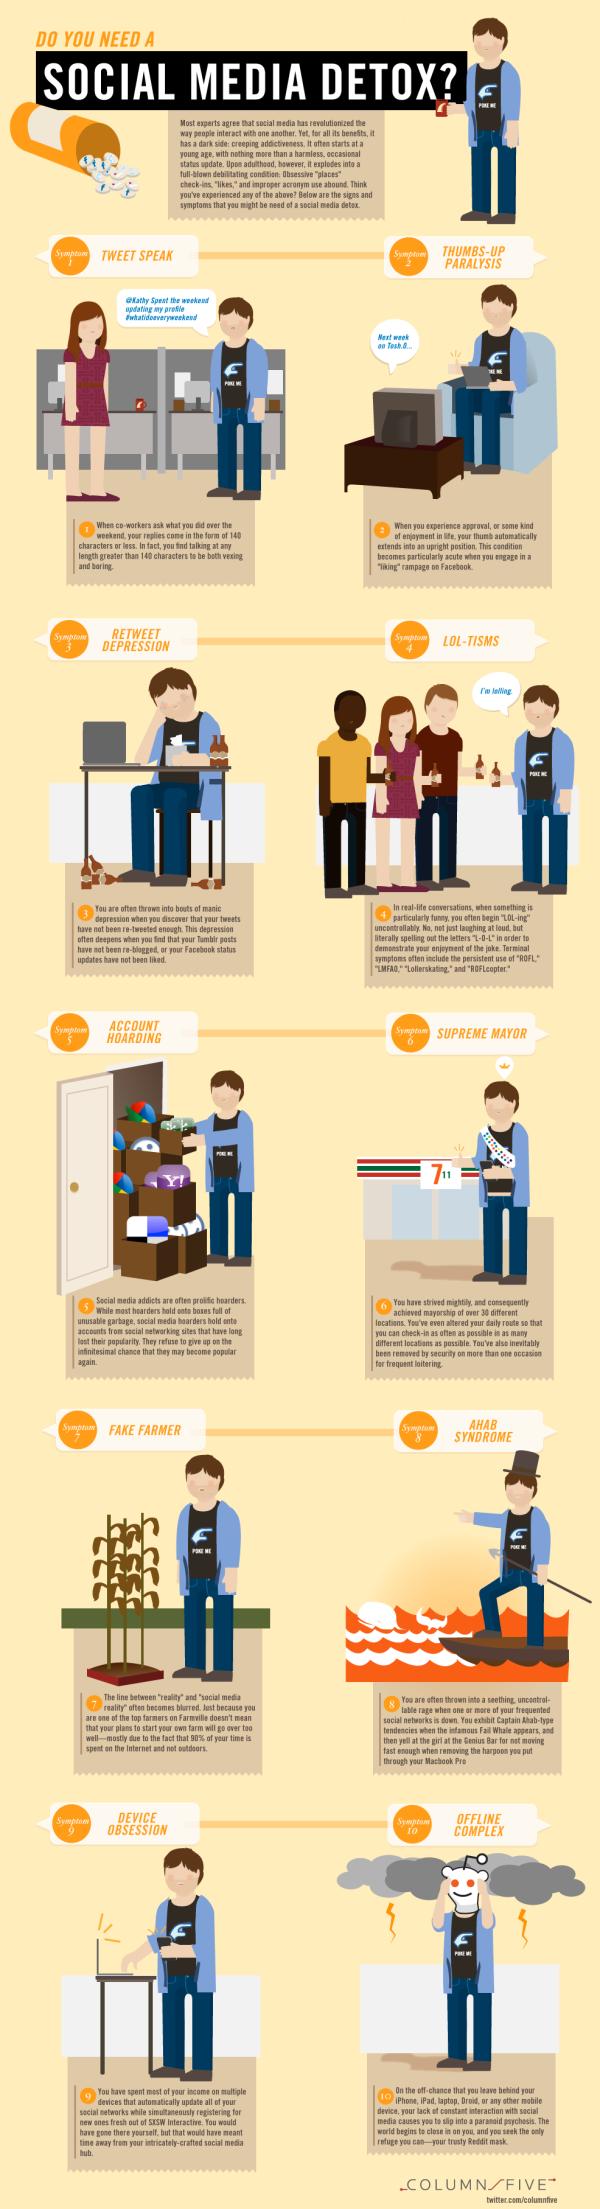 Do You Need a Social Media Detox? infographic